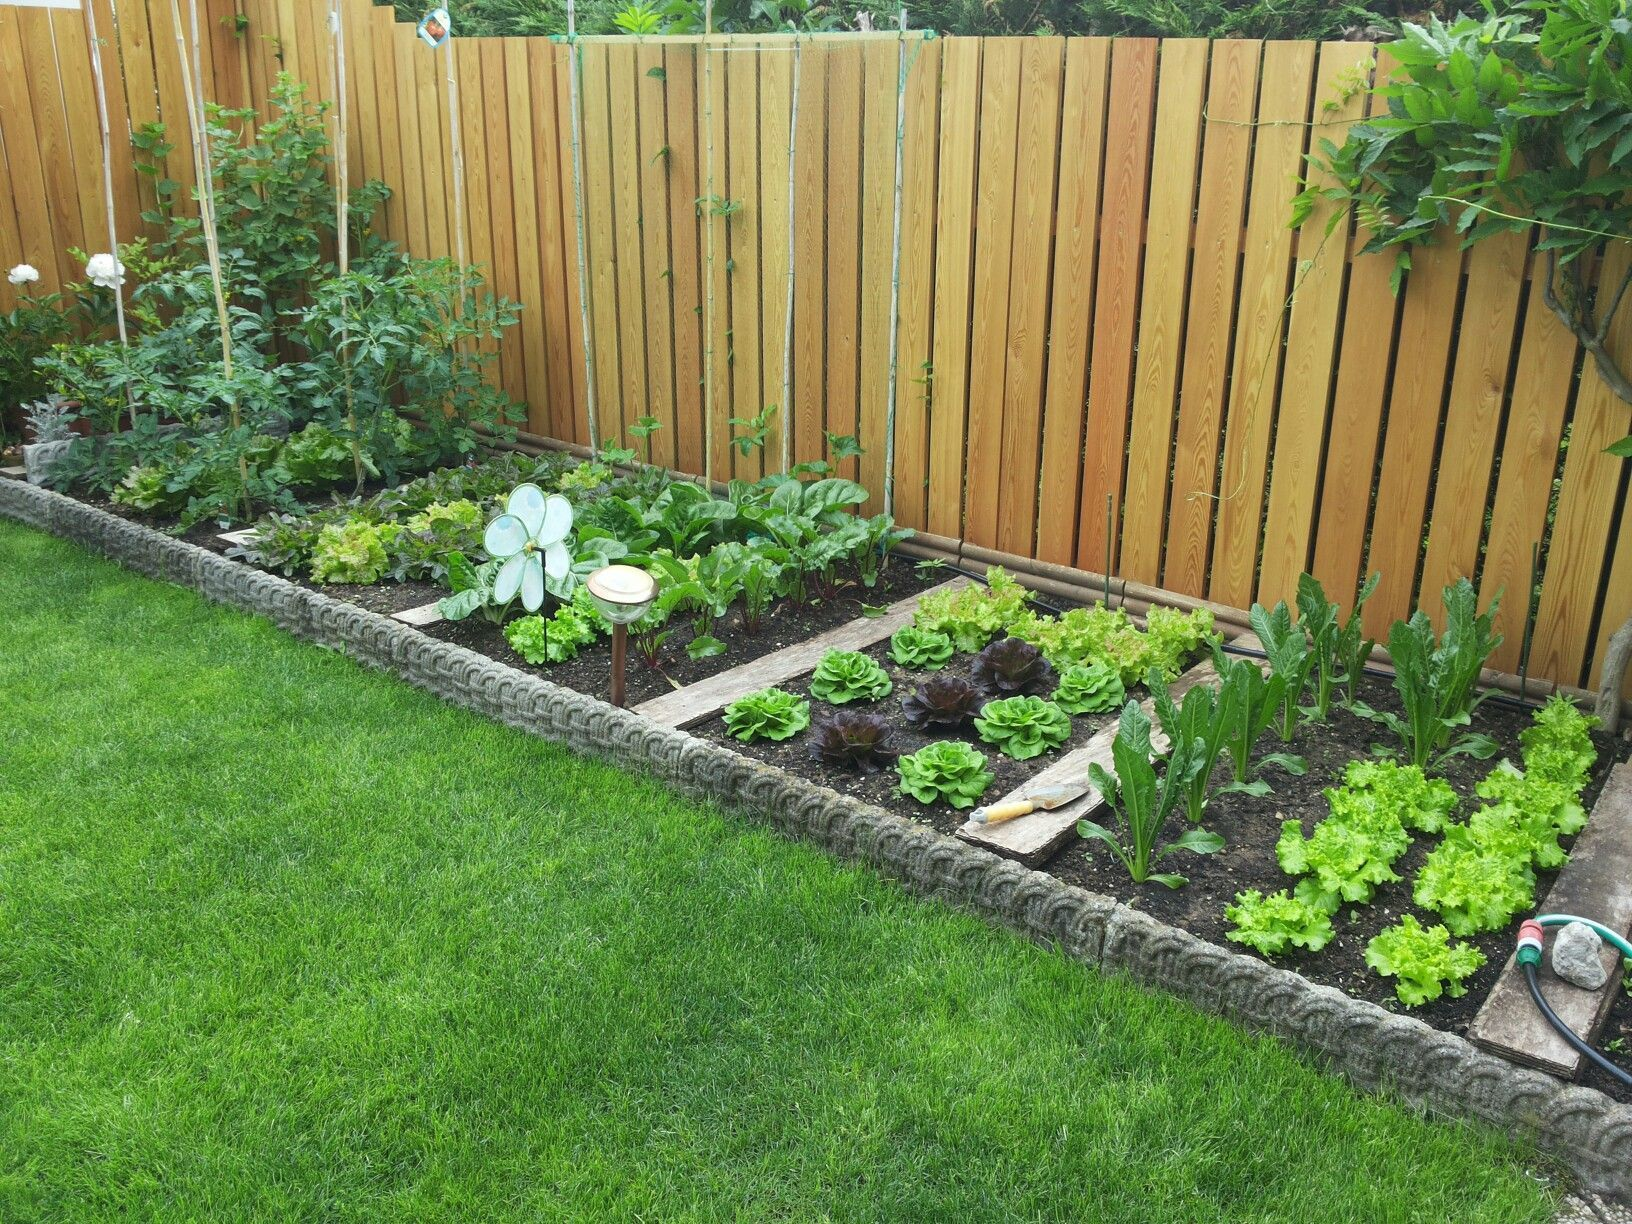 Vegetable Garden Landscape Ideas in 4  Home vegetable garden